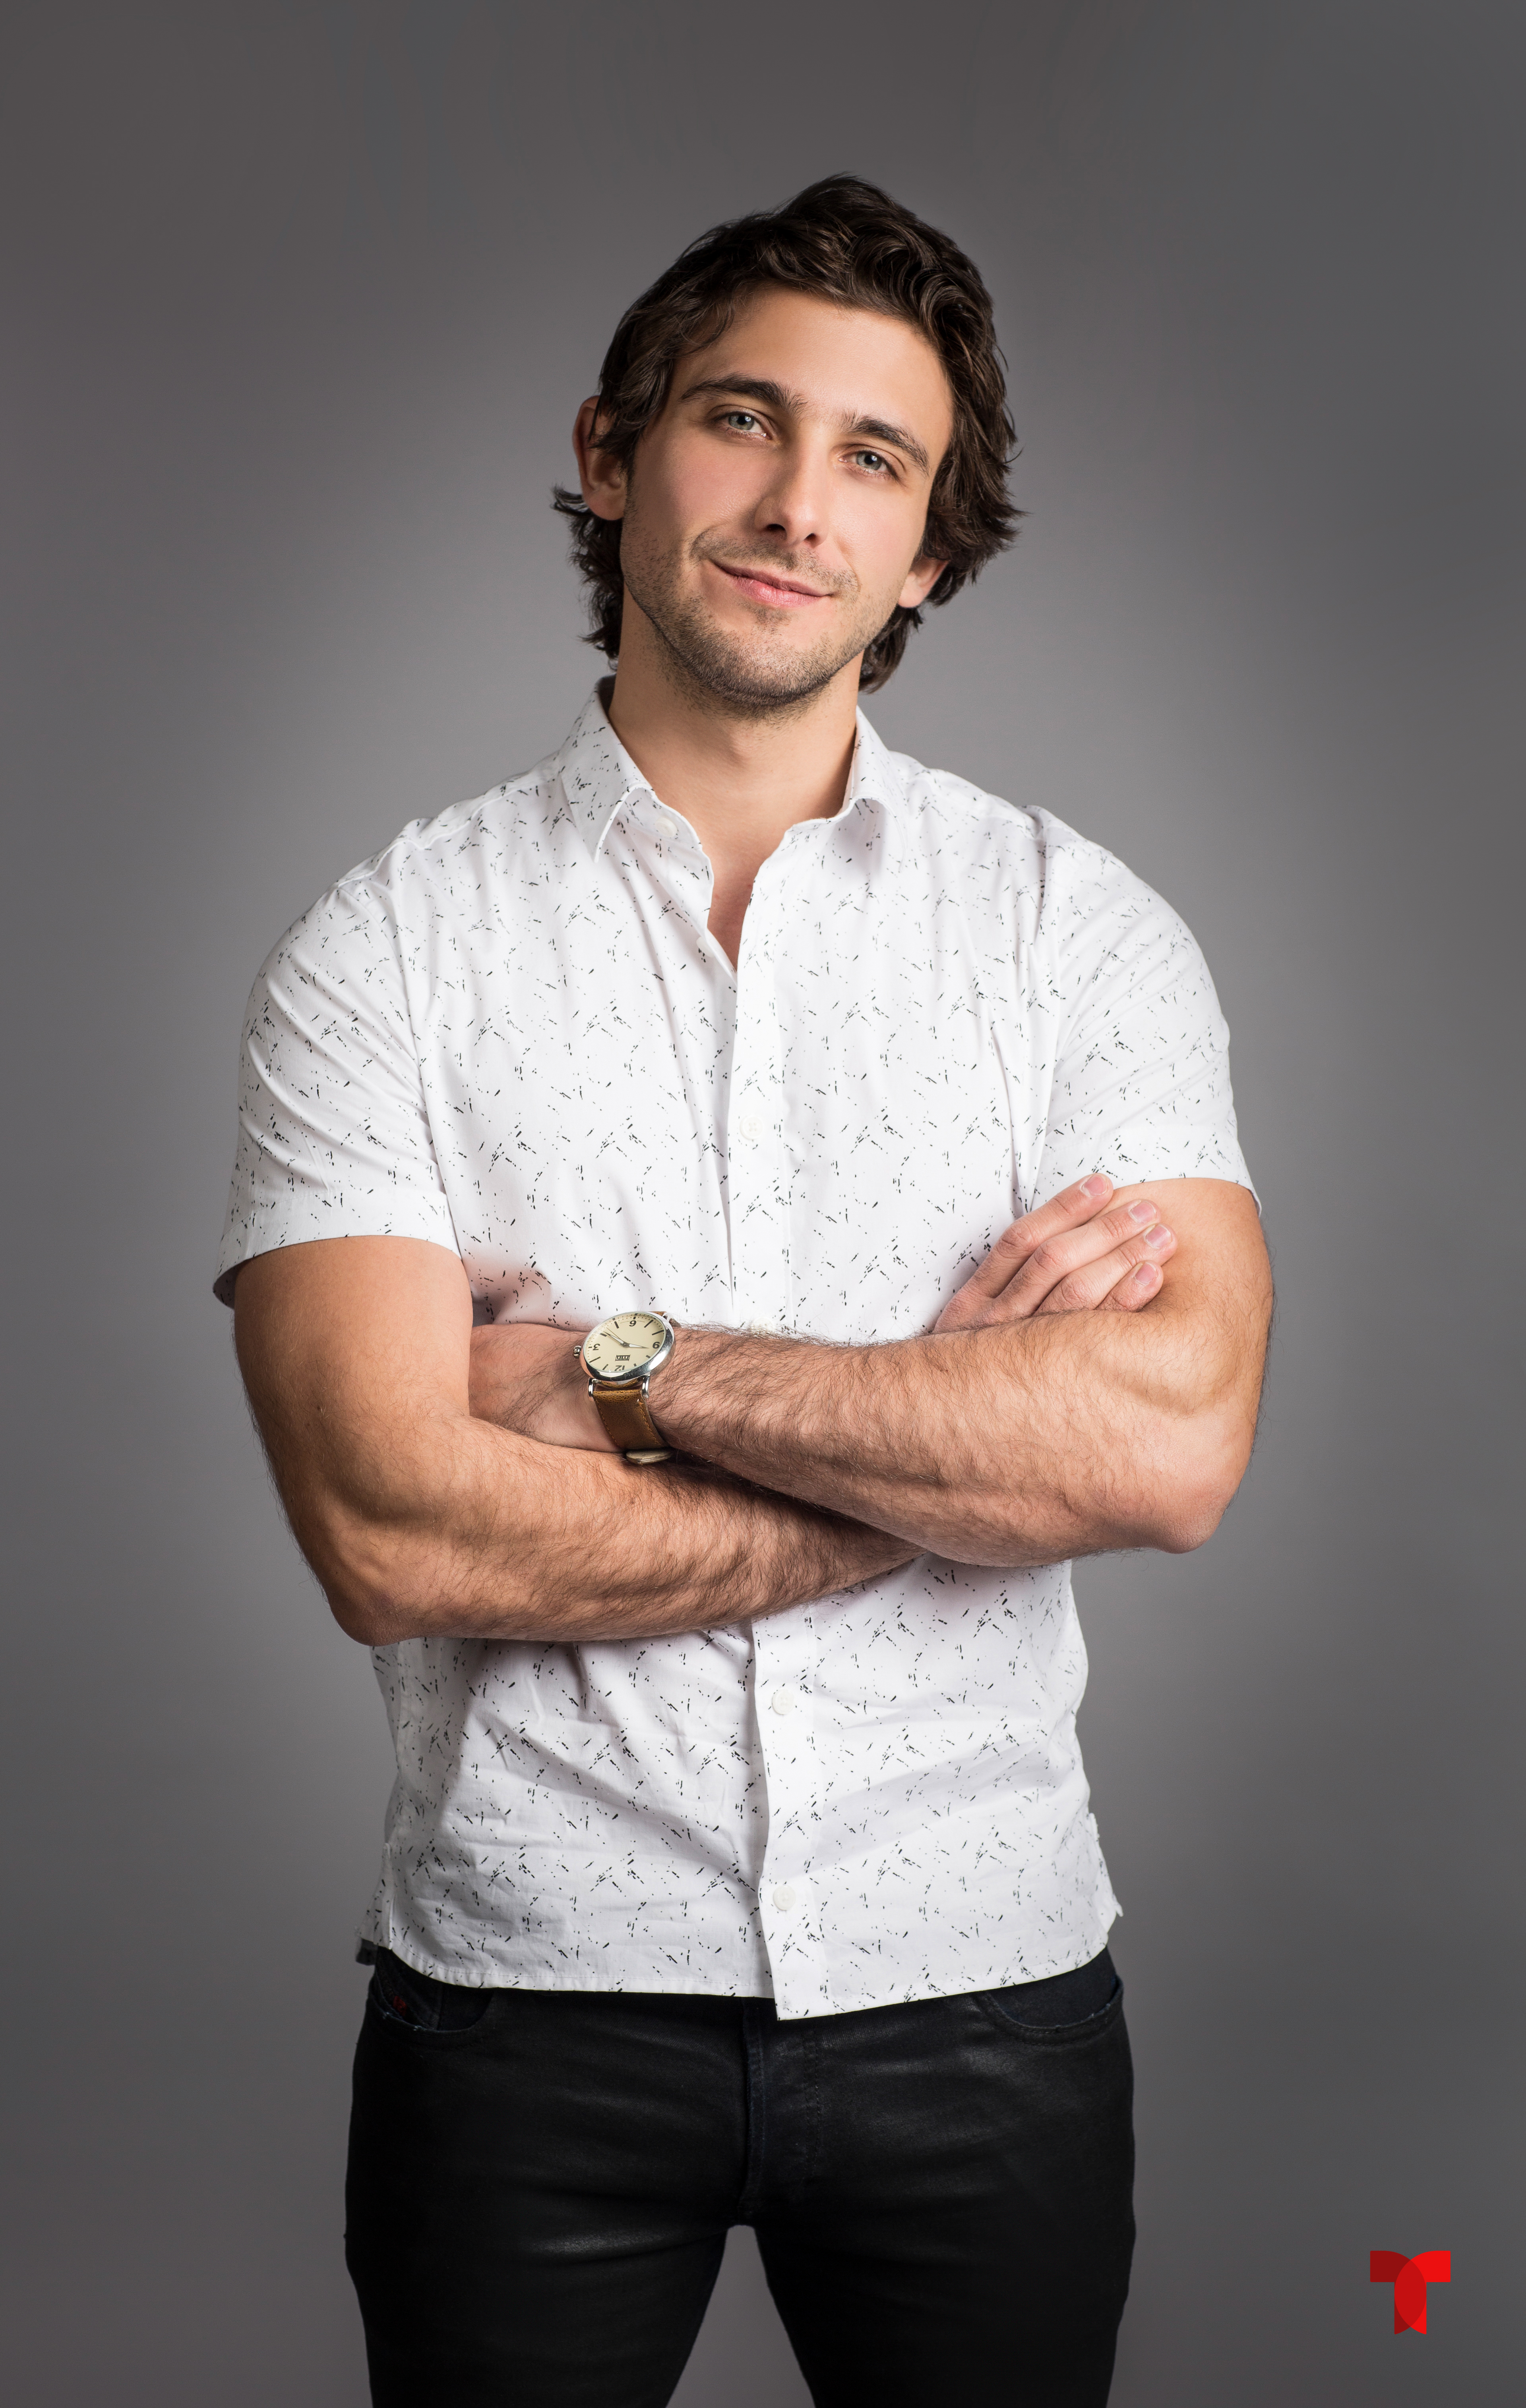 Emiliano Zurita como Felipe Quintanilla_002 copia